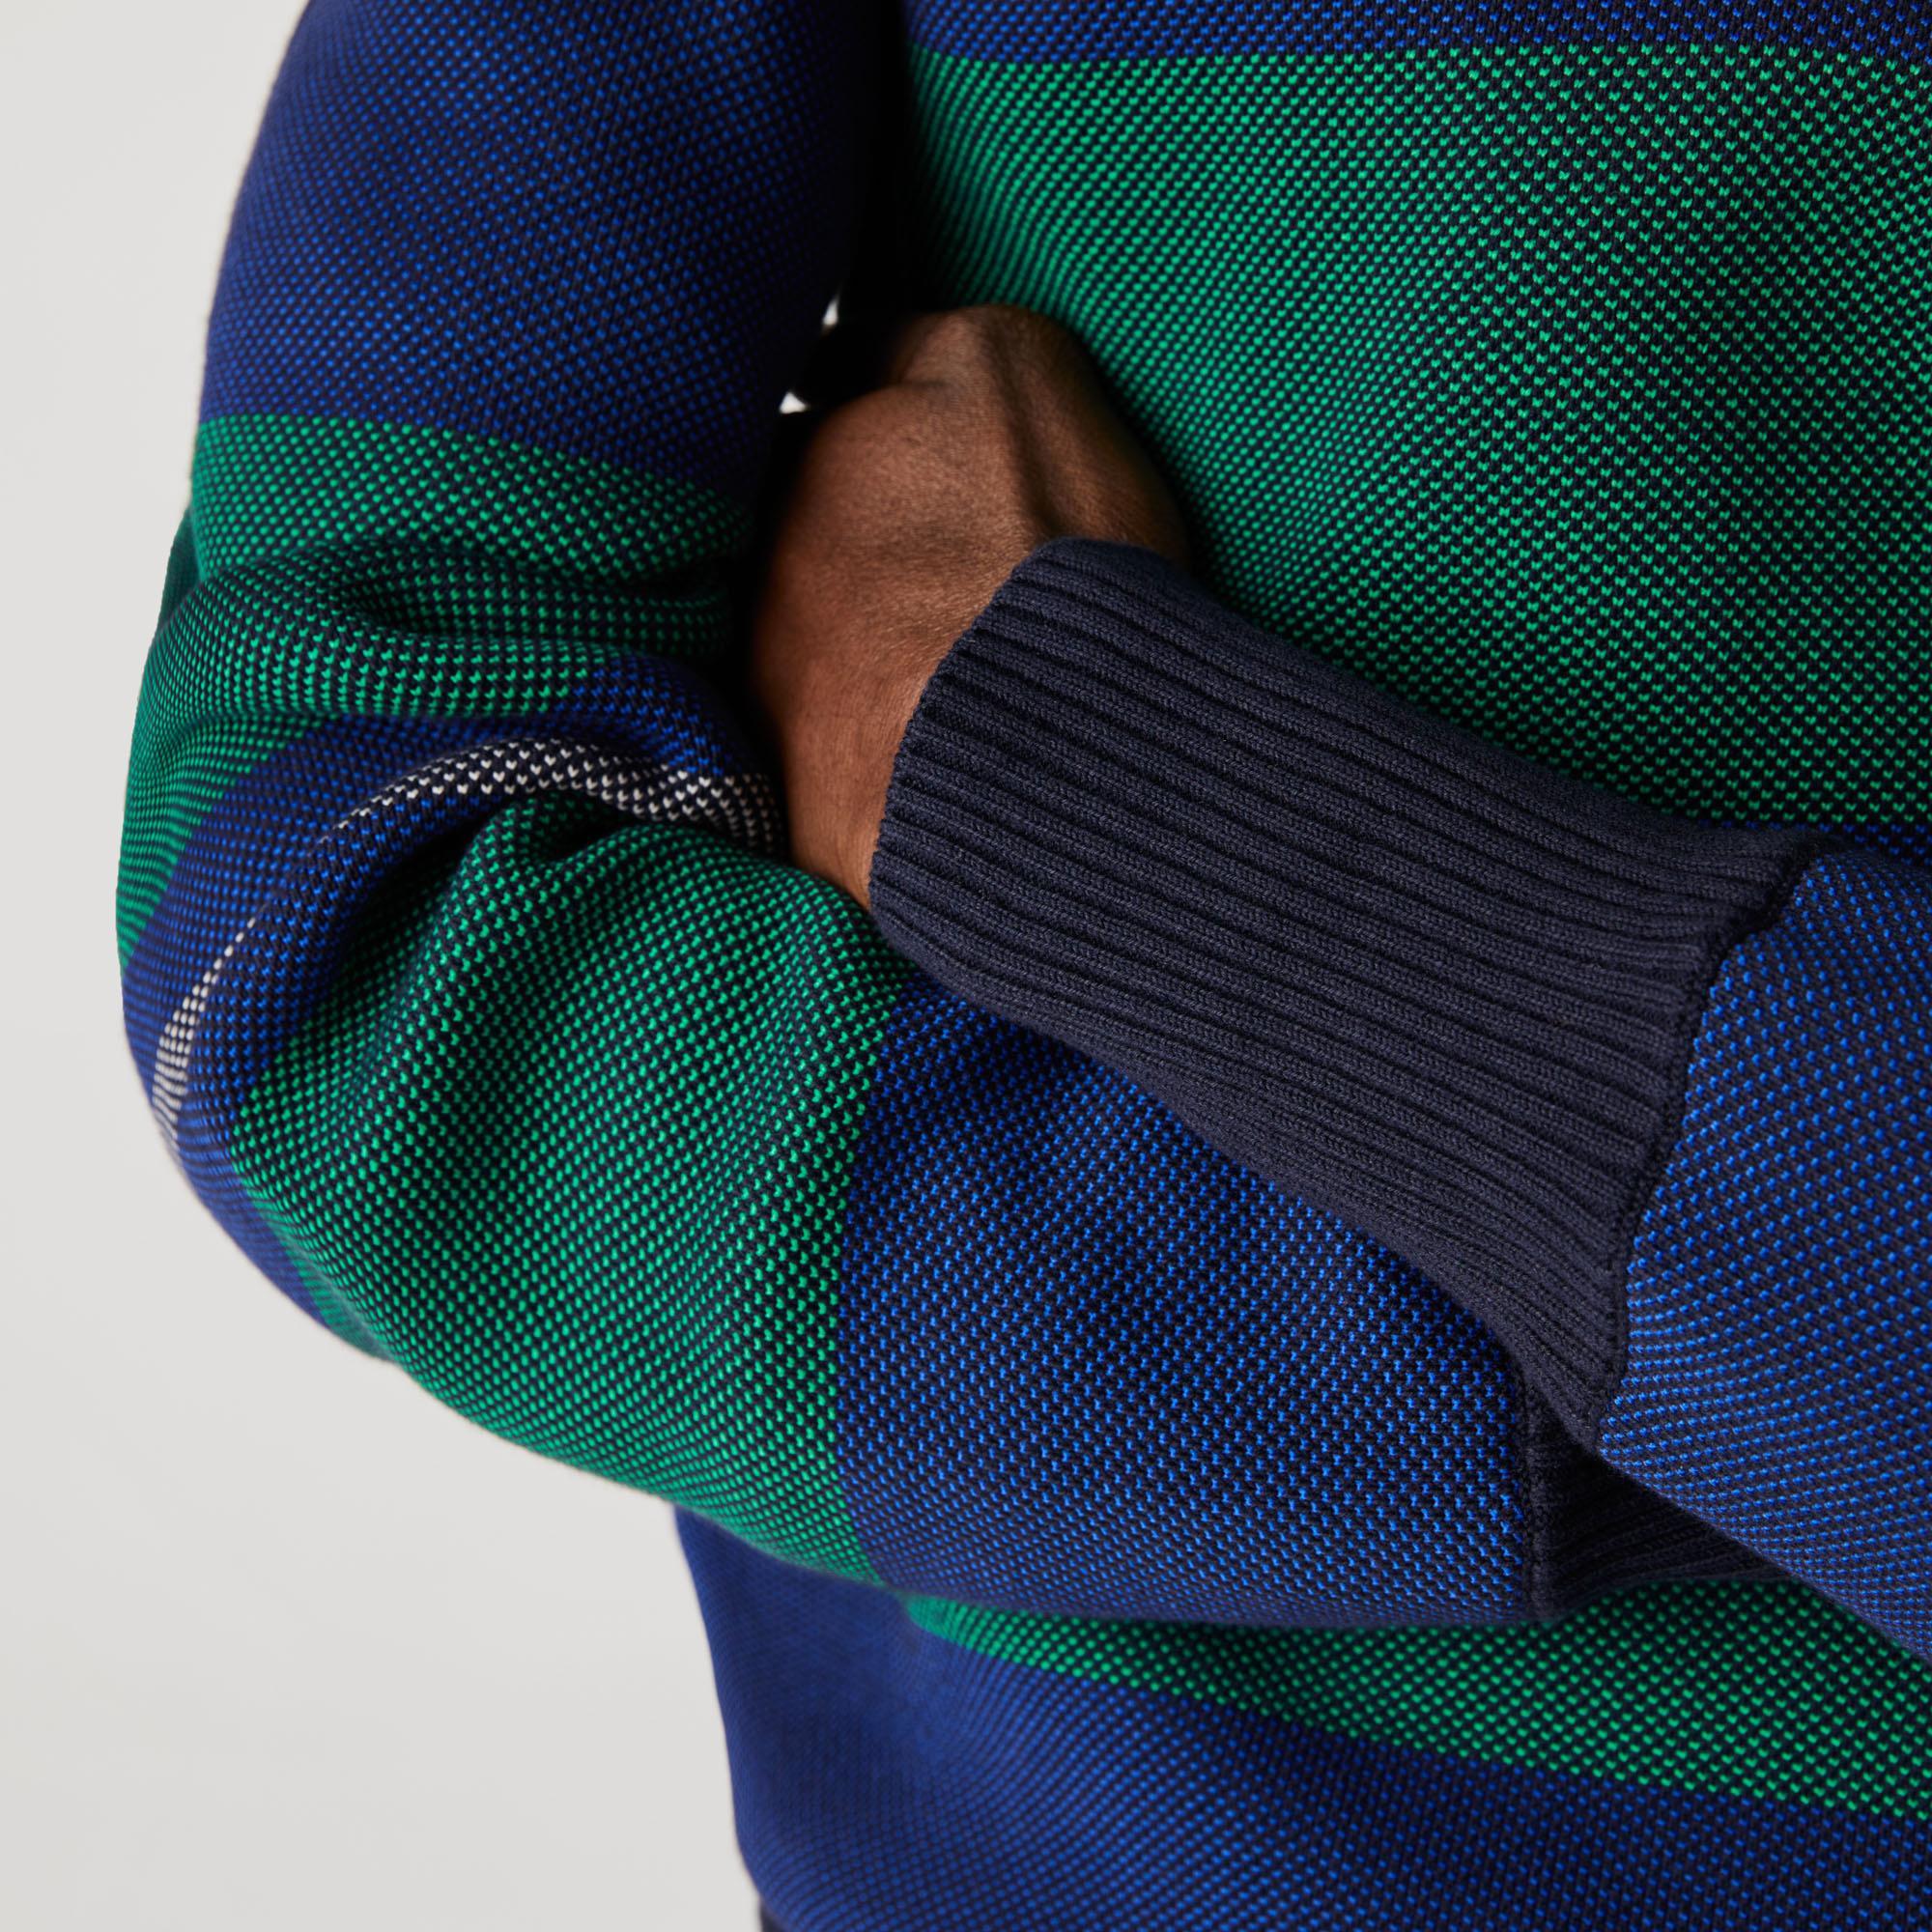 Lacoste Erkek Polo Yaka Çizgili Renk Bloklu Renkli Triko Kazak